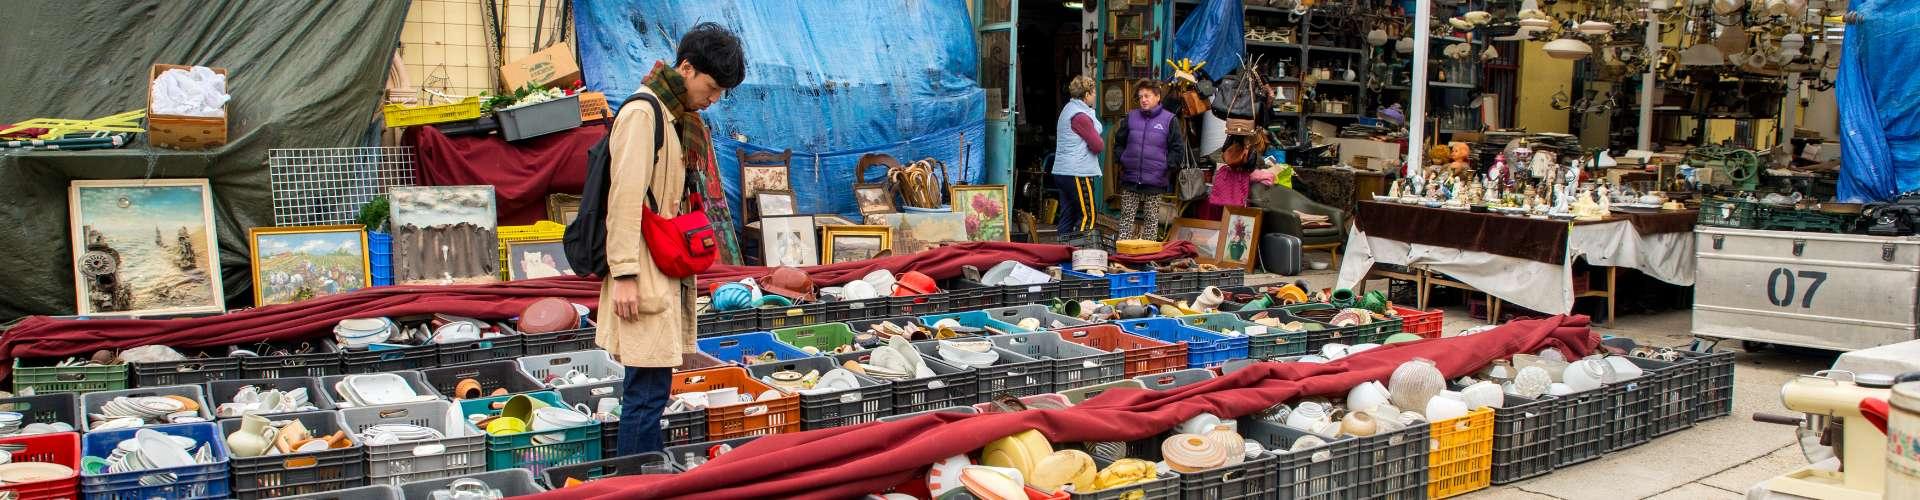 üzletközpont piac